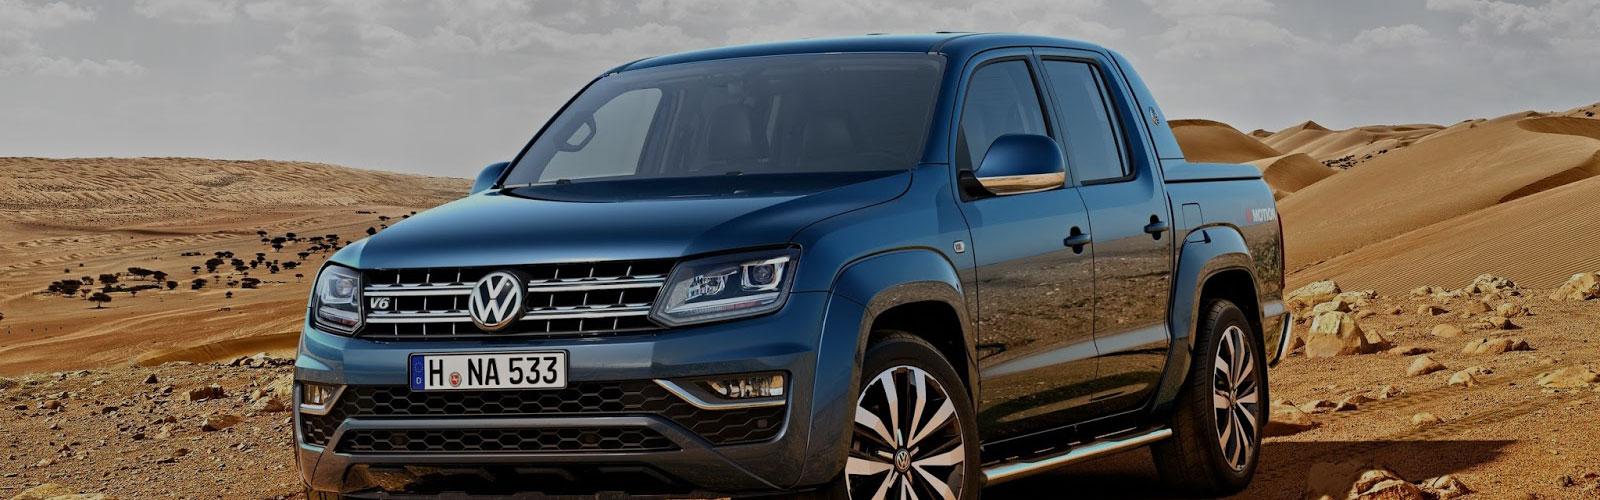 Volkswagen Επαγγελματικά Νέα Μοντέλα - Γ. Καψιώχας Α.Ε.Β.Ε. - Εξουσιοδοτημένος έμπορος Kosmokar